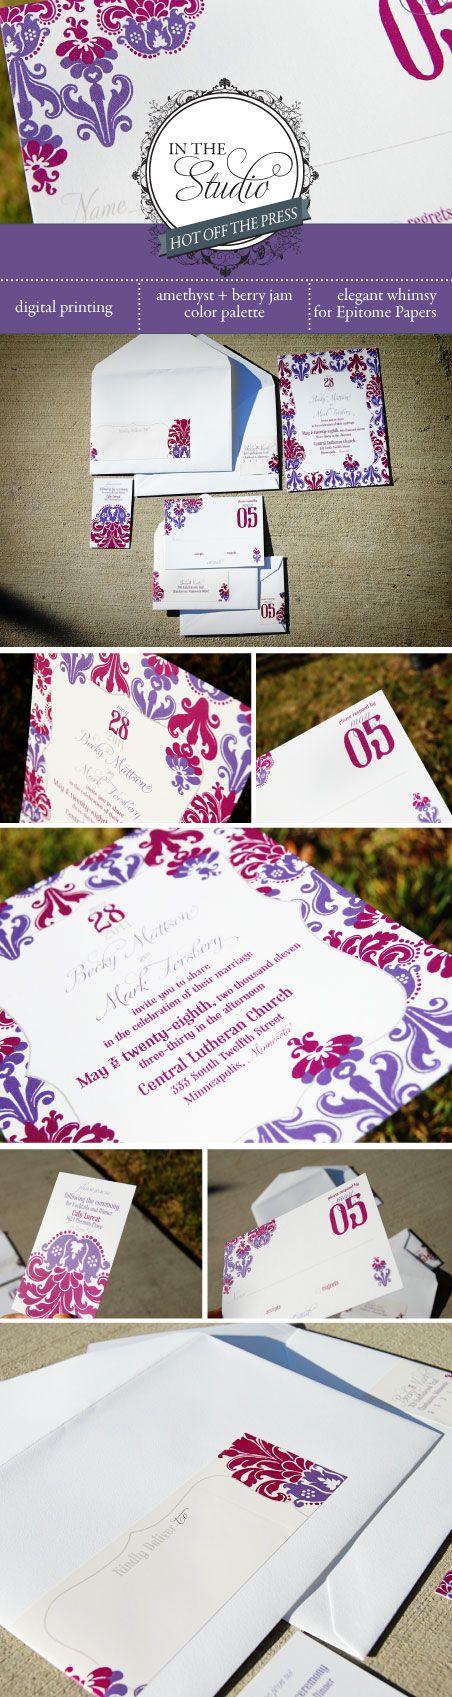 wedding invitation designs%0A invitations  Plum WeddingWedding StationaryWedding InvitationsInvitation  DesignWedding